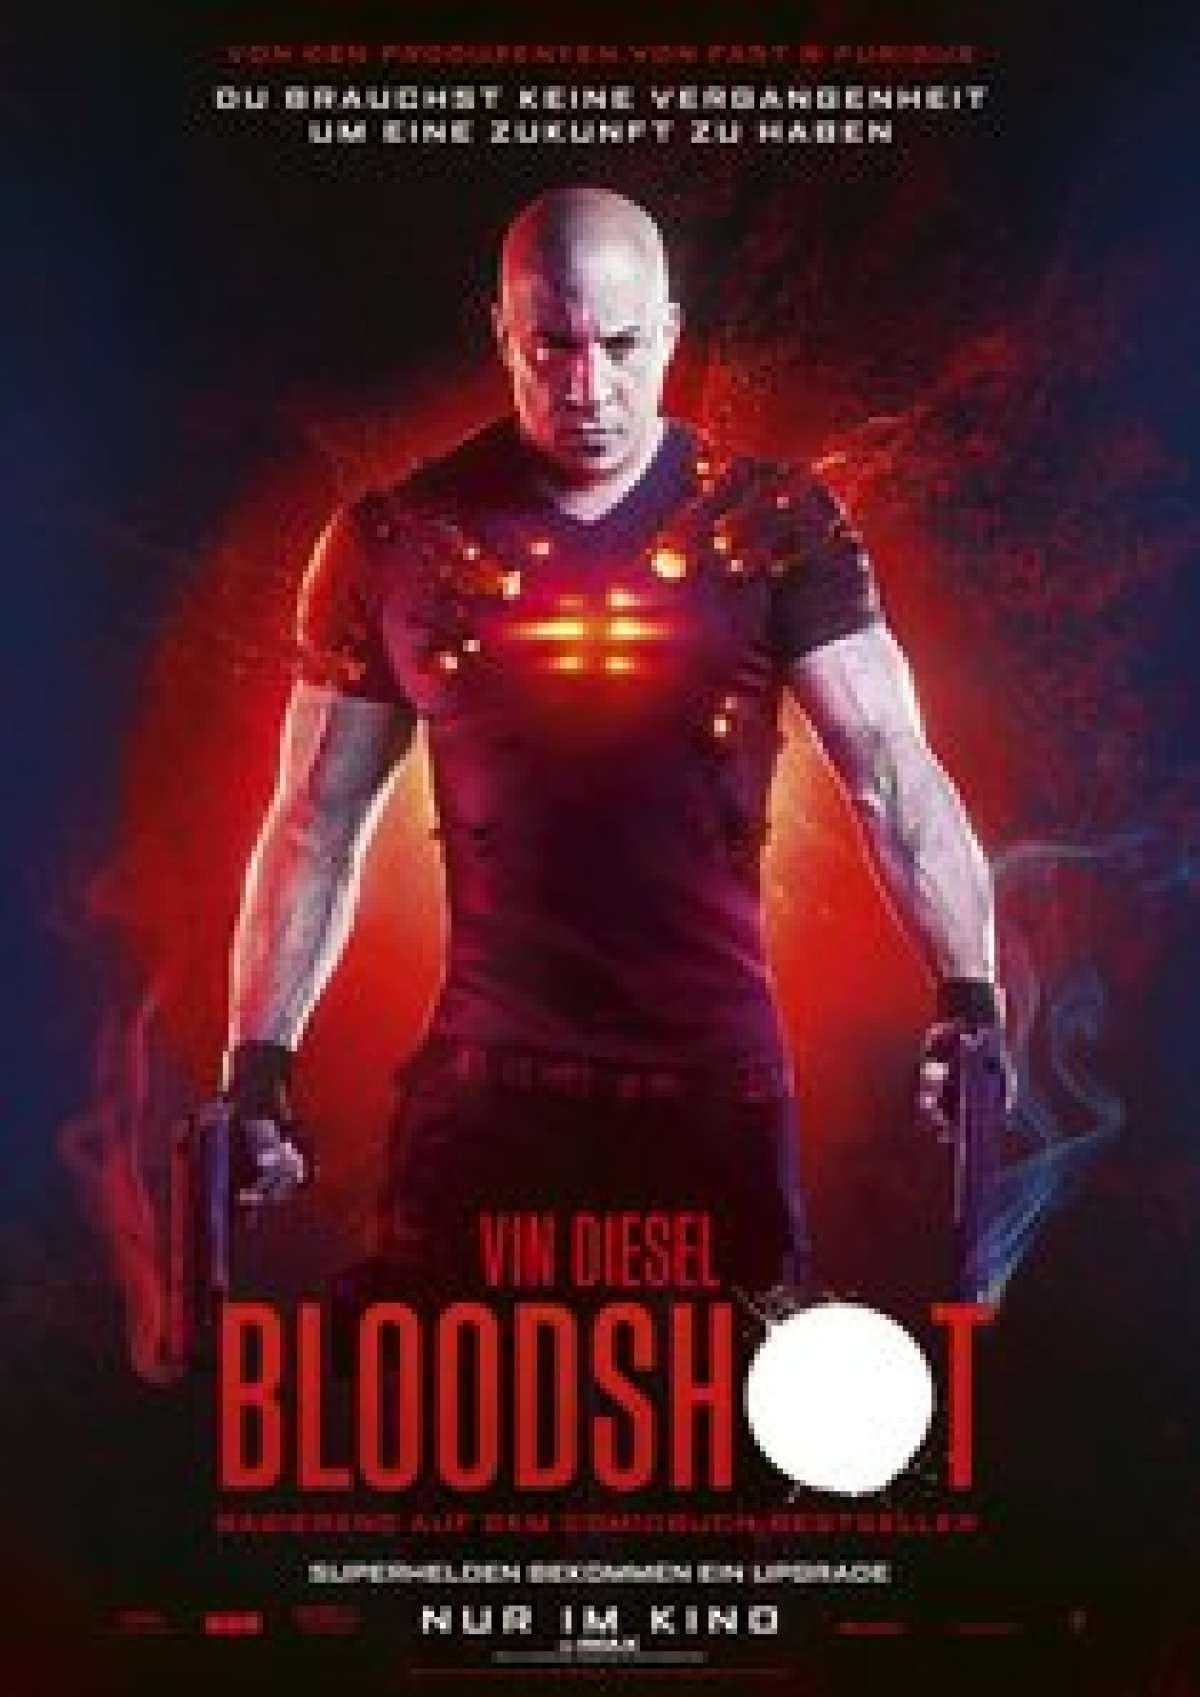 Bloodshot - Cine-Royal  - Fritzlar